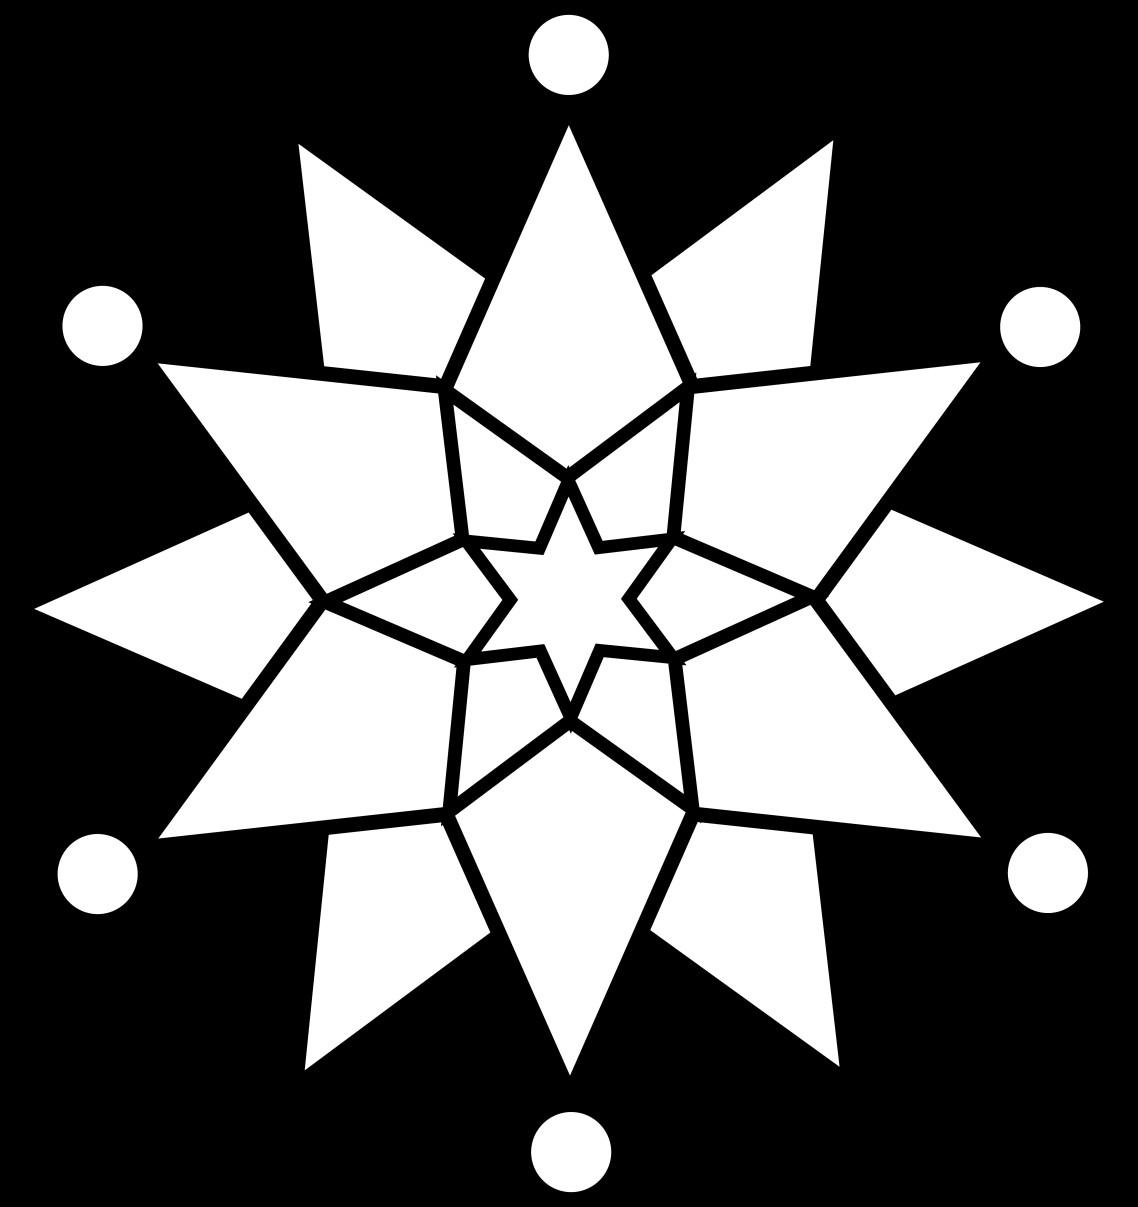 Black Christmas Snowflake Clipart.